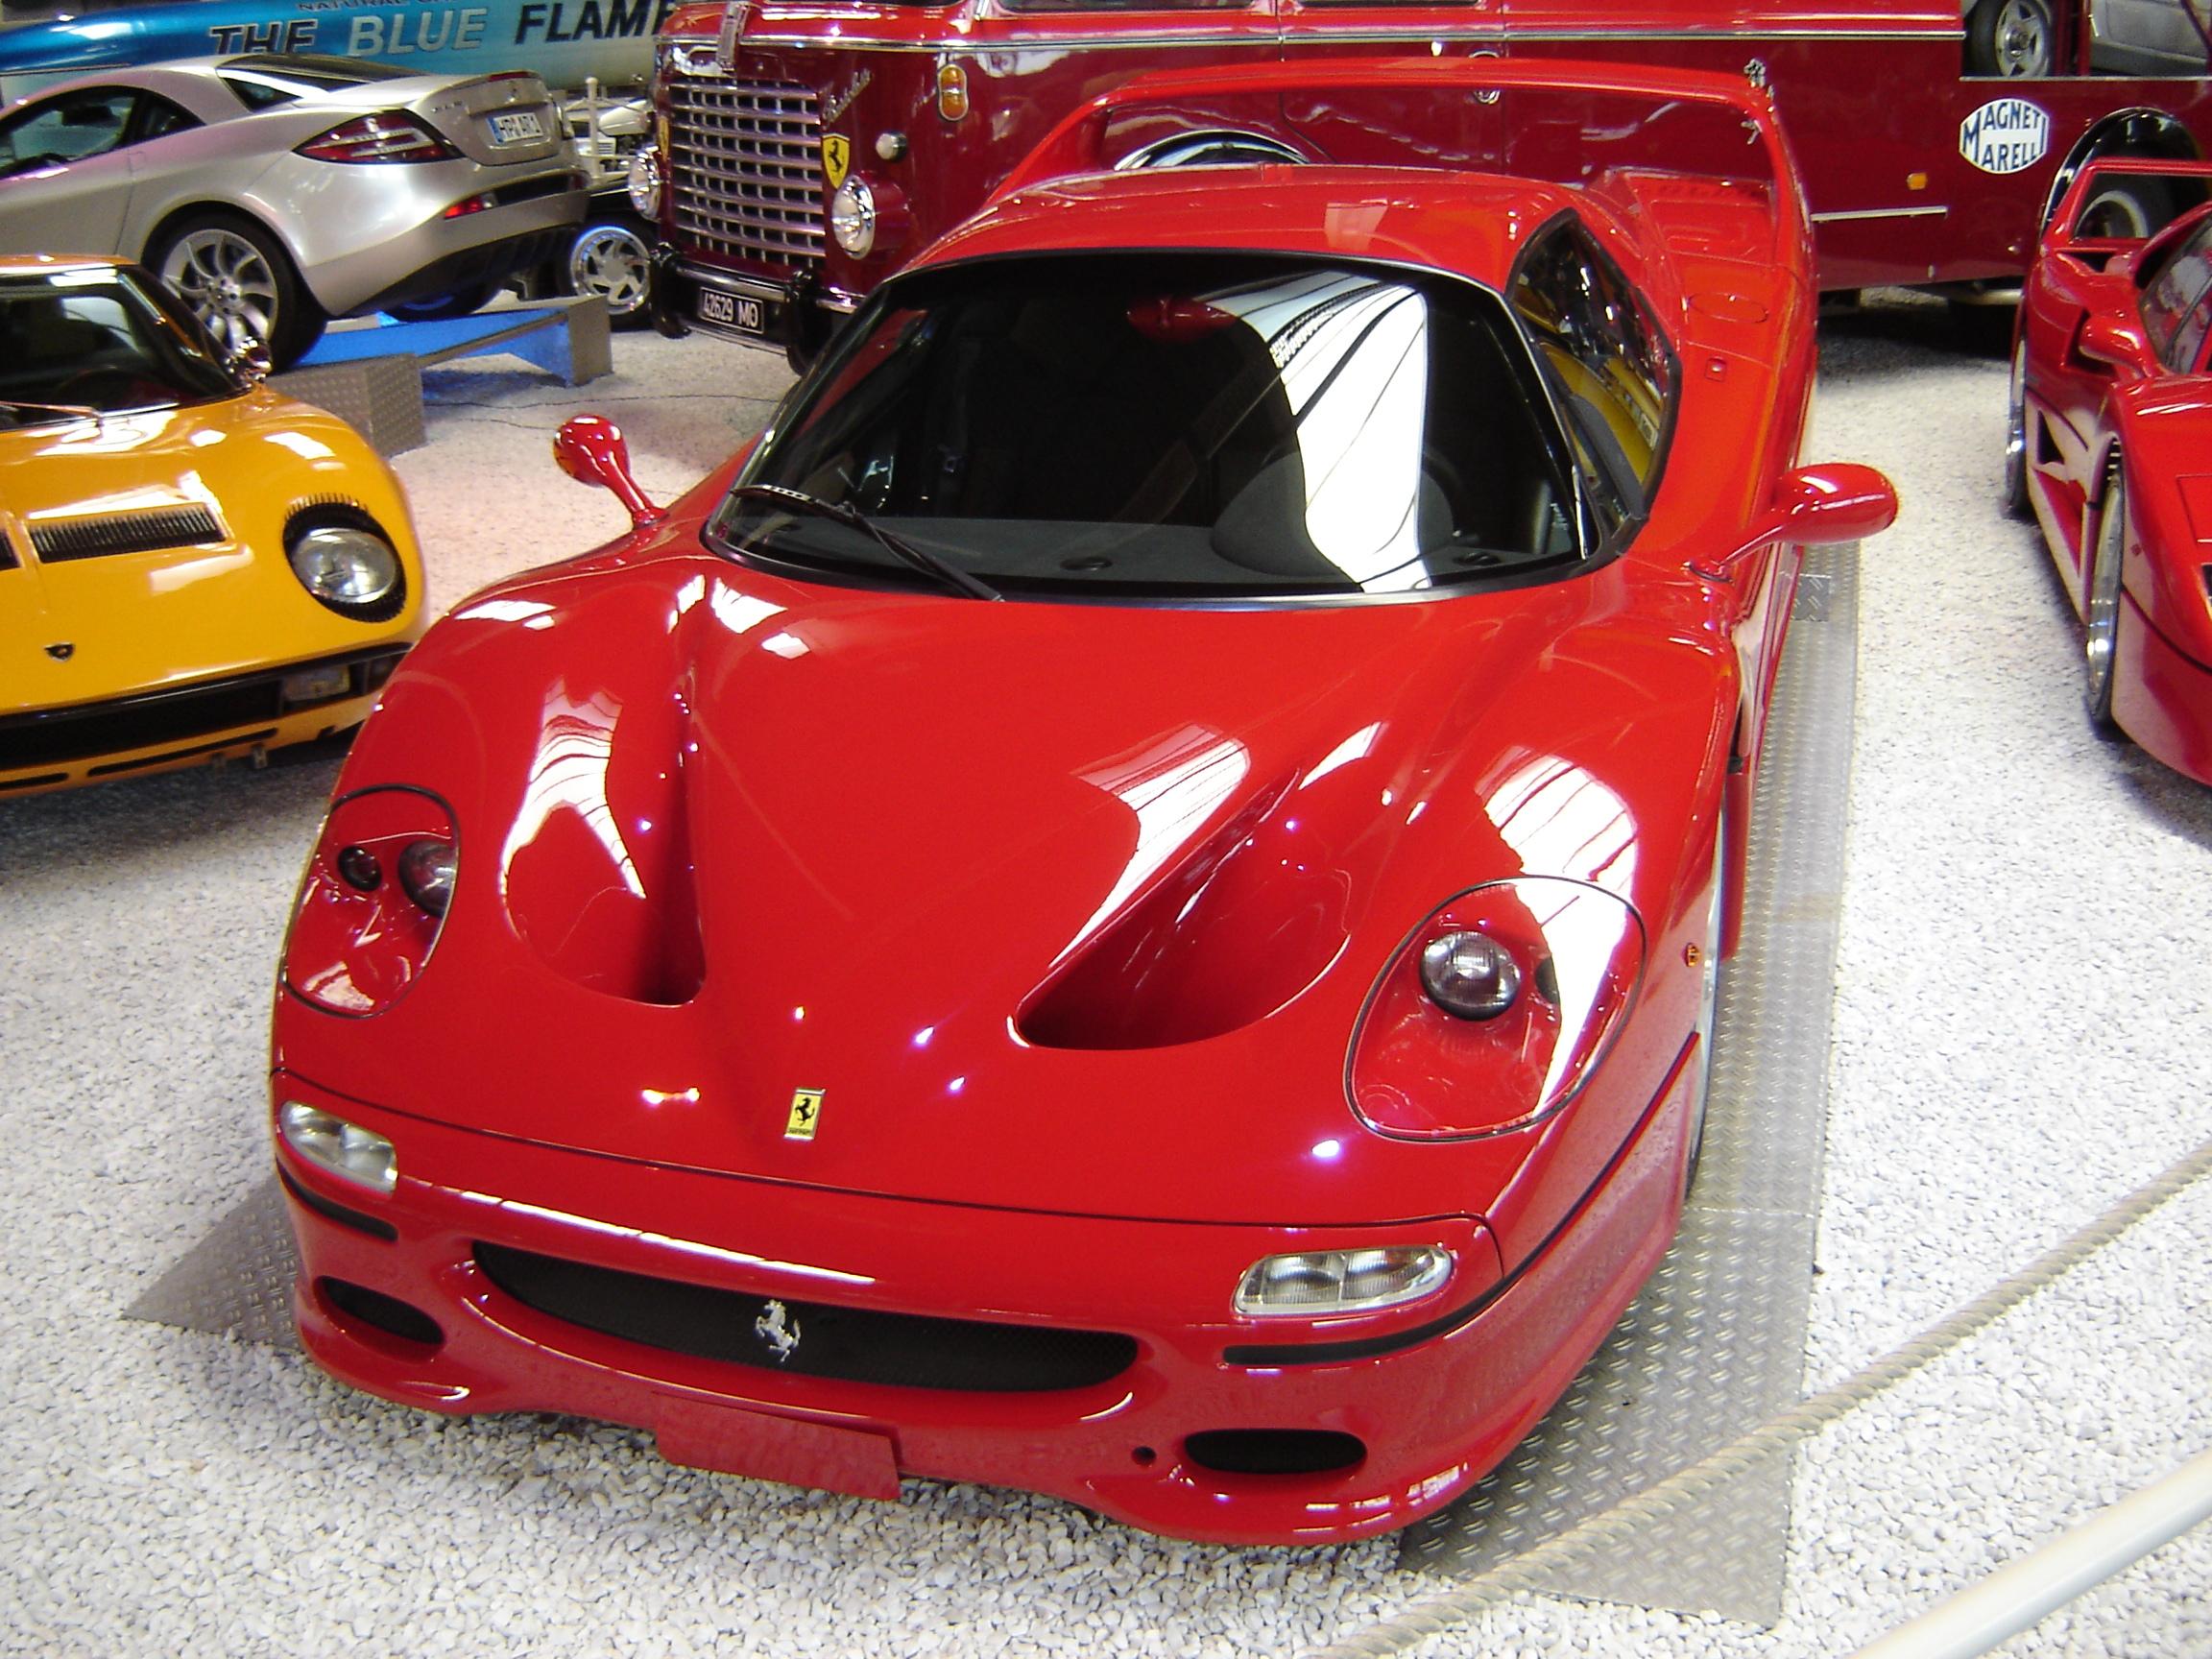 3dtuning of ferrari f50 coupe 1995 3dtuning unique on line ferrari f50 coupe 1995 vanachro Choice Image